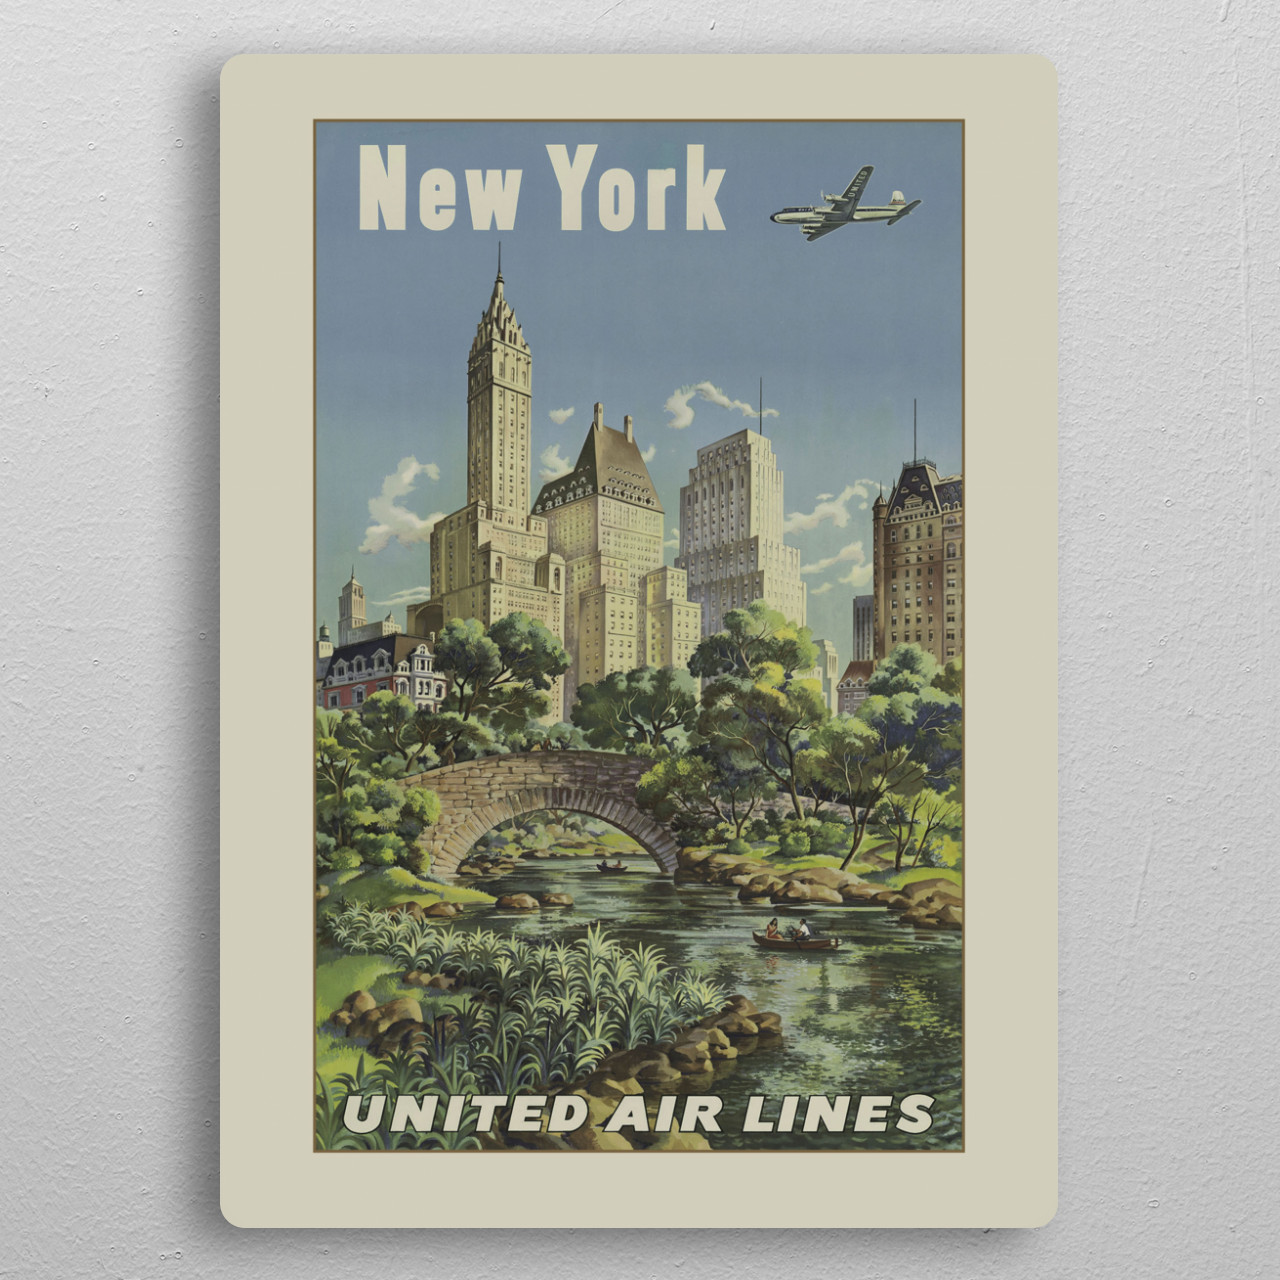 Vintage Travel Poster pocket-size metal print from Black box